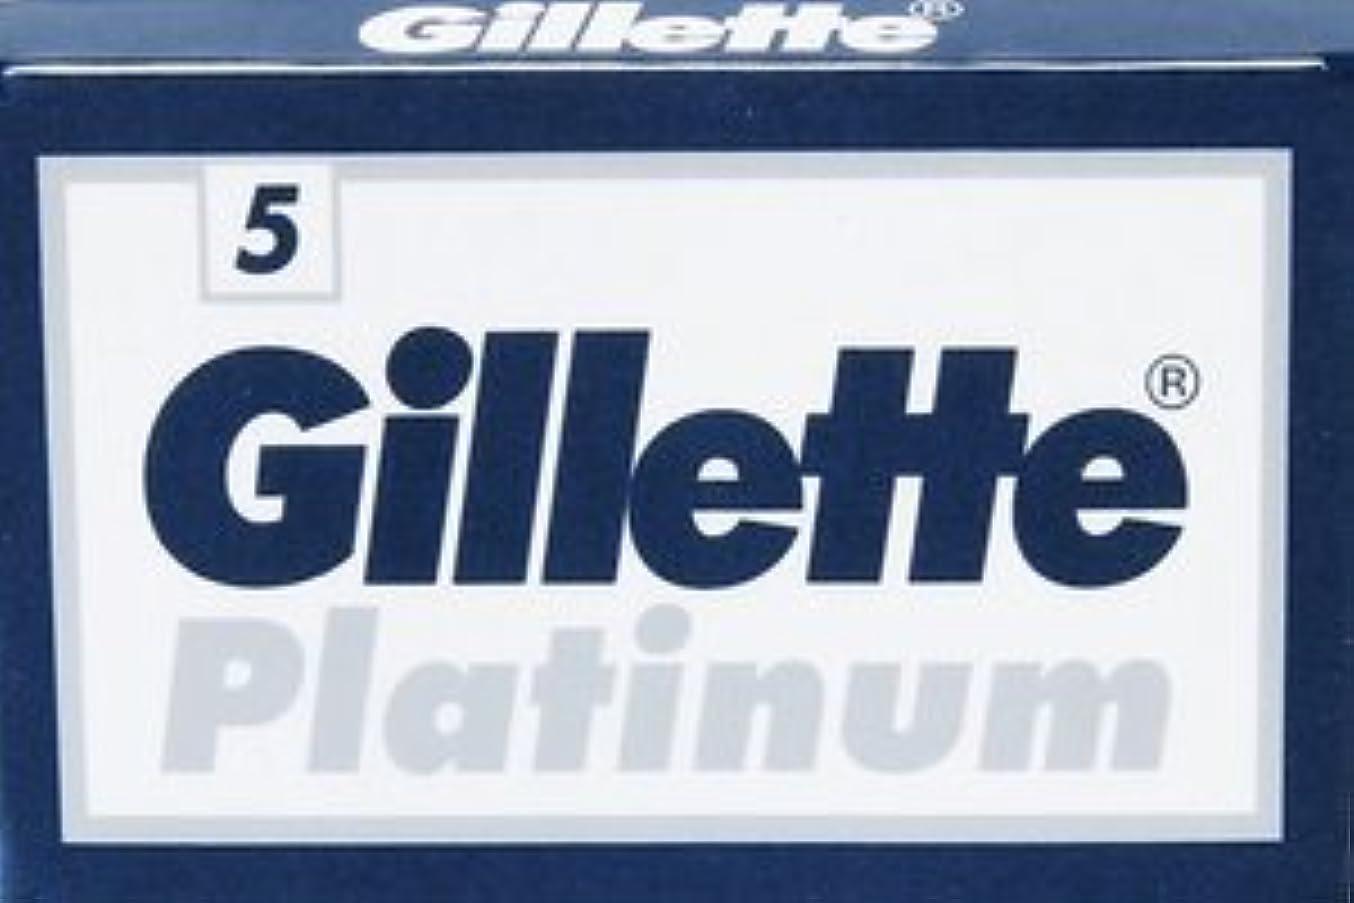 Gillette Platinum 両刃替刃 5枚入り(5枚入り1 個セット)【並行輸入品】